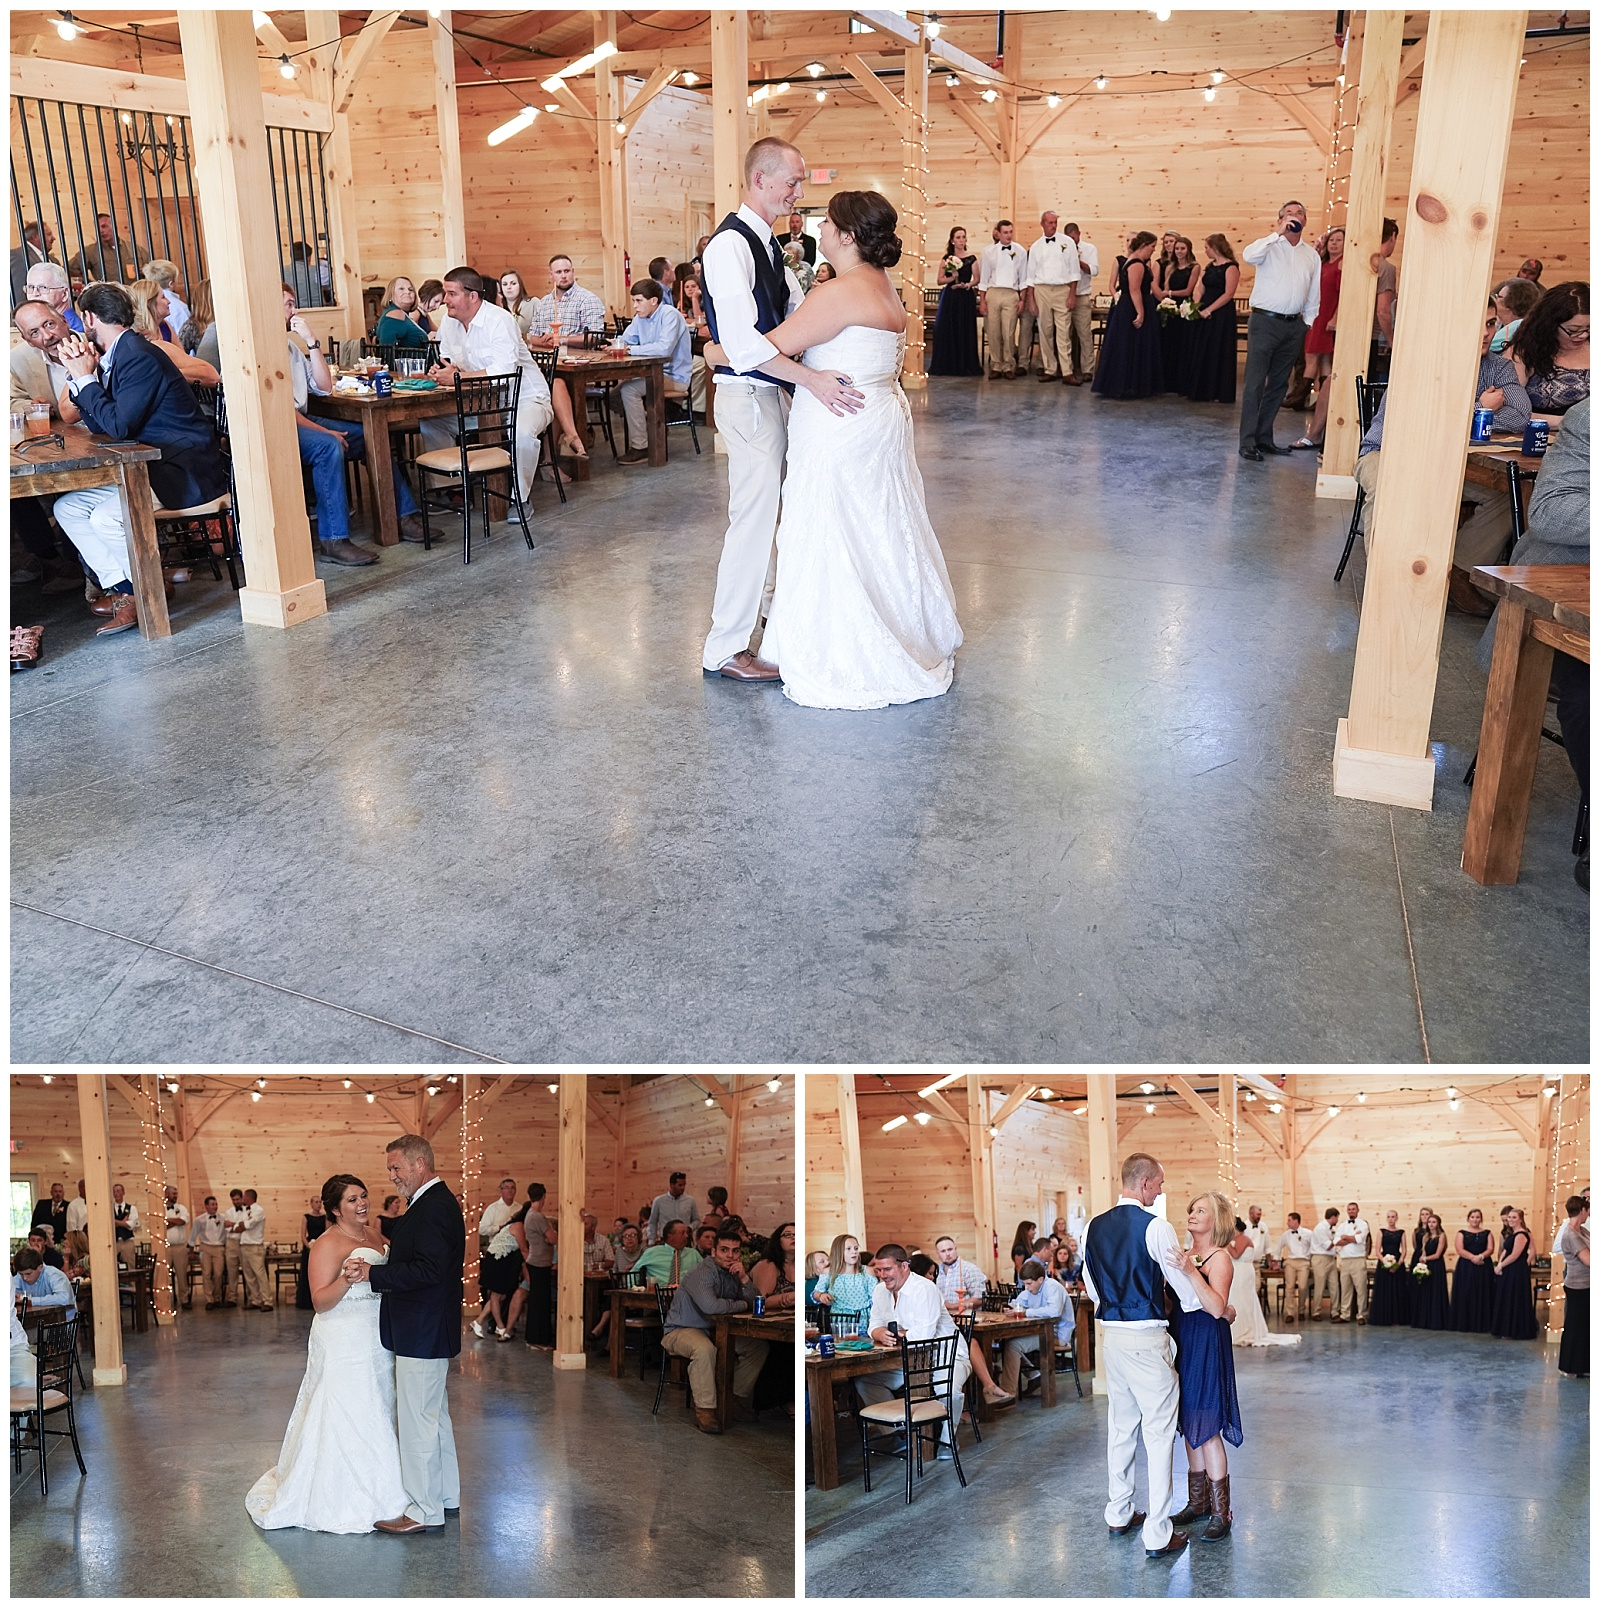 Chana + Travis: Rustic Barn Wedding at Forevermore Farm | Palmetto State Weddings`1